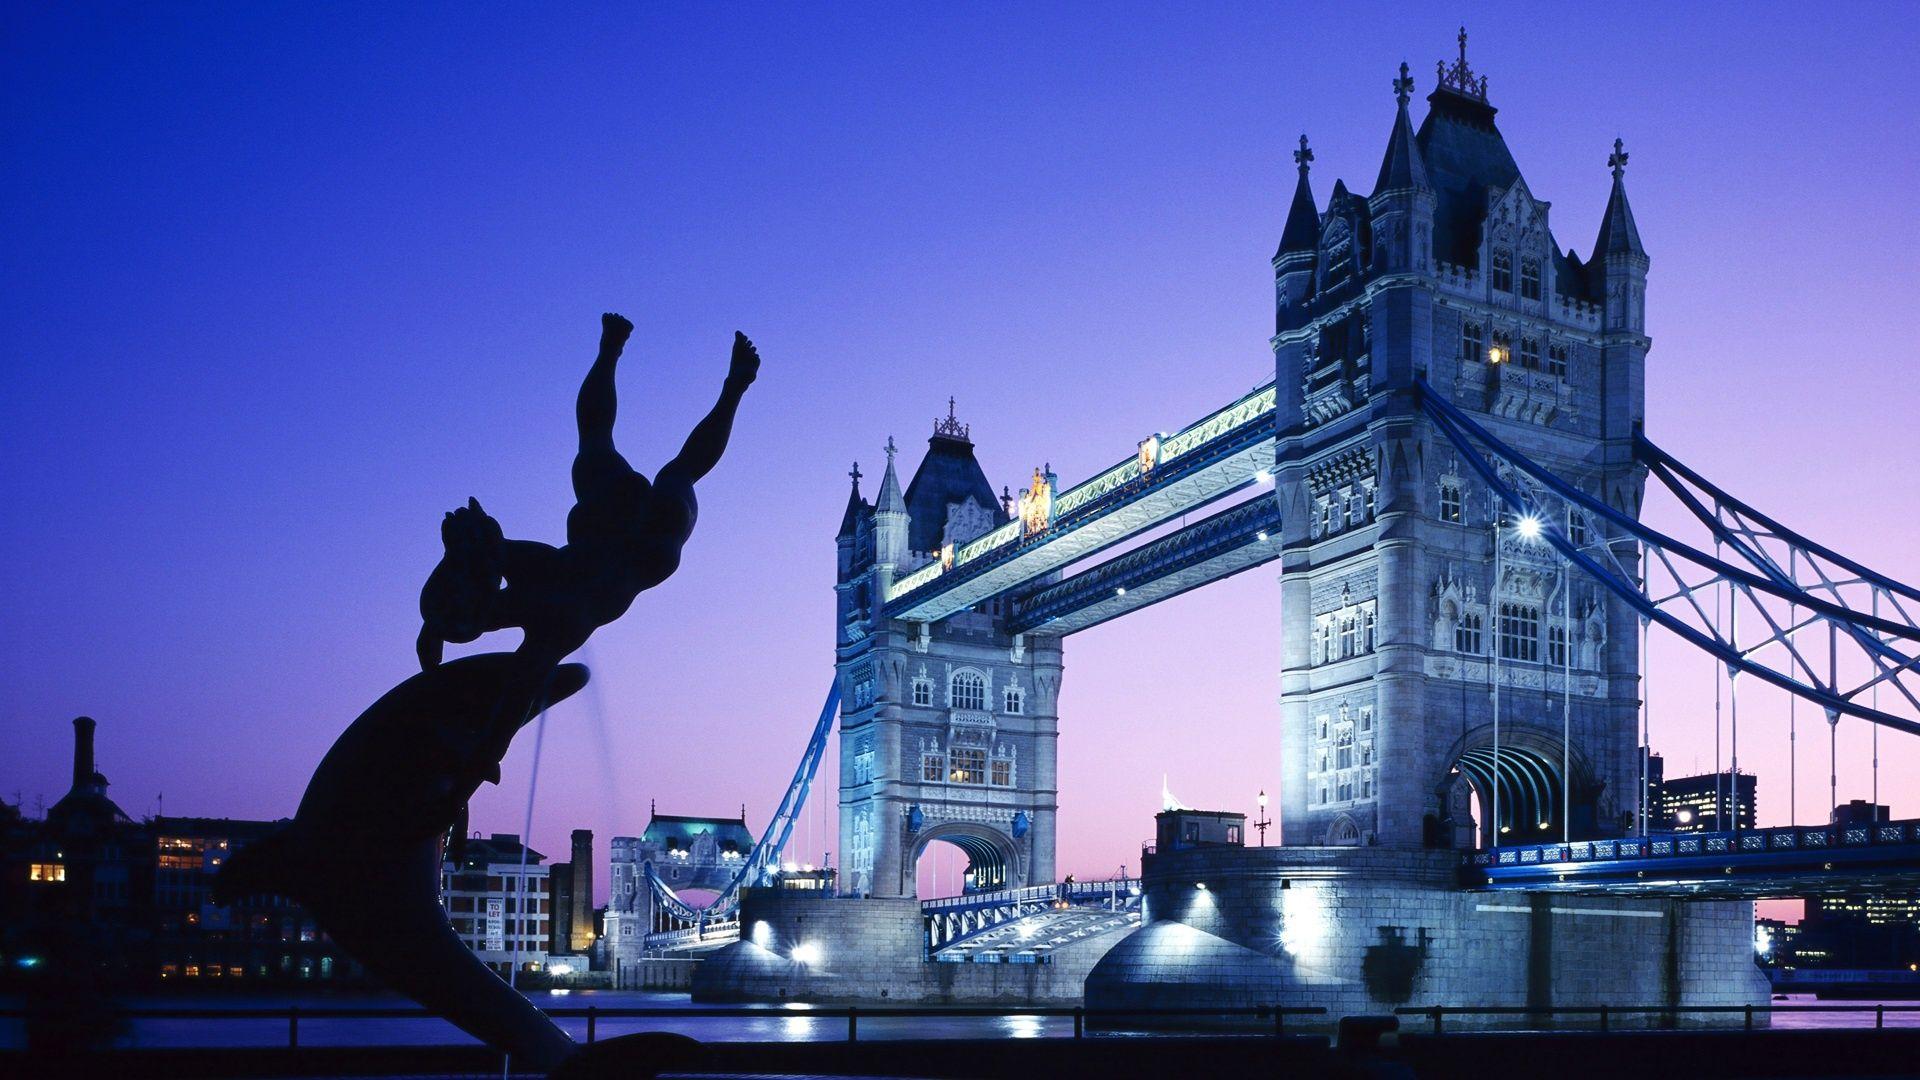 London Tower Bridge Uk Cityscape Wallpaper